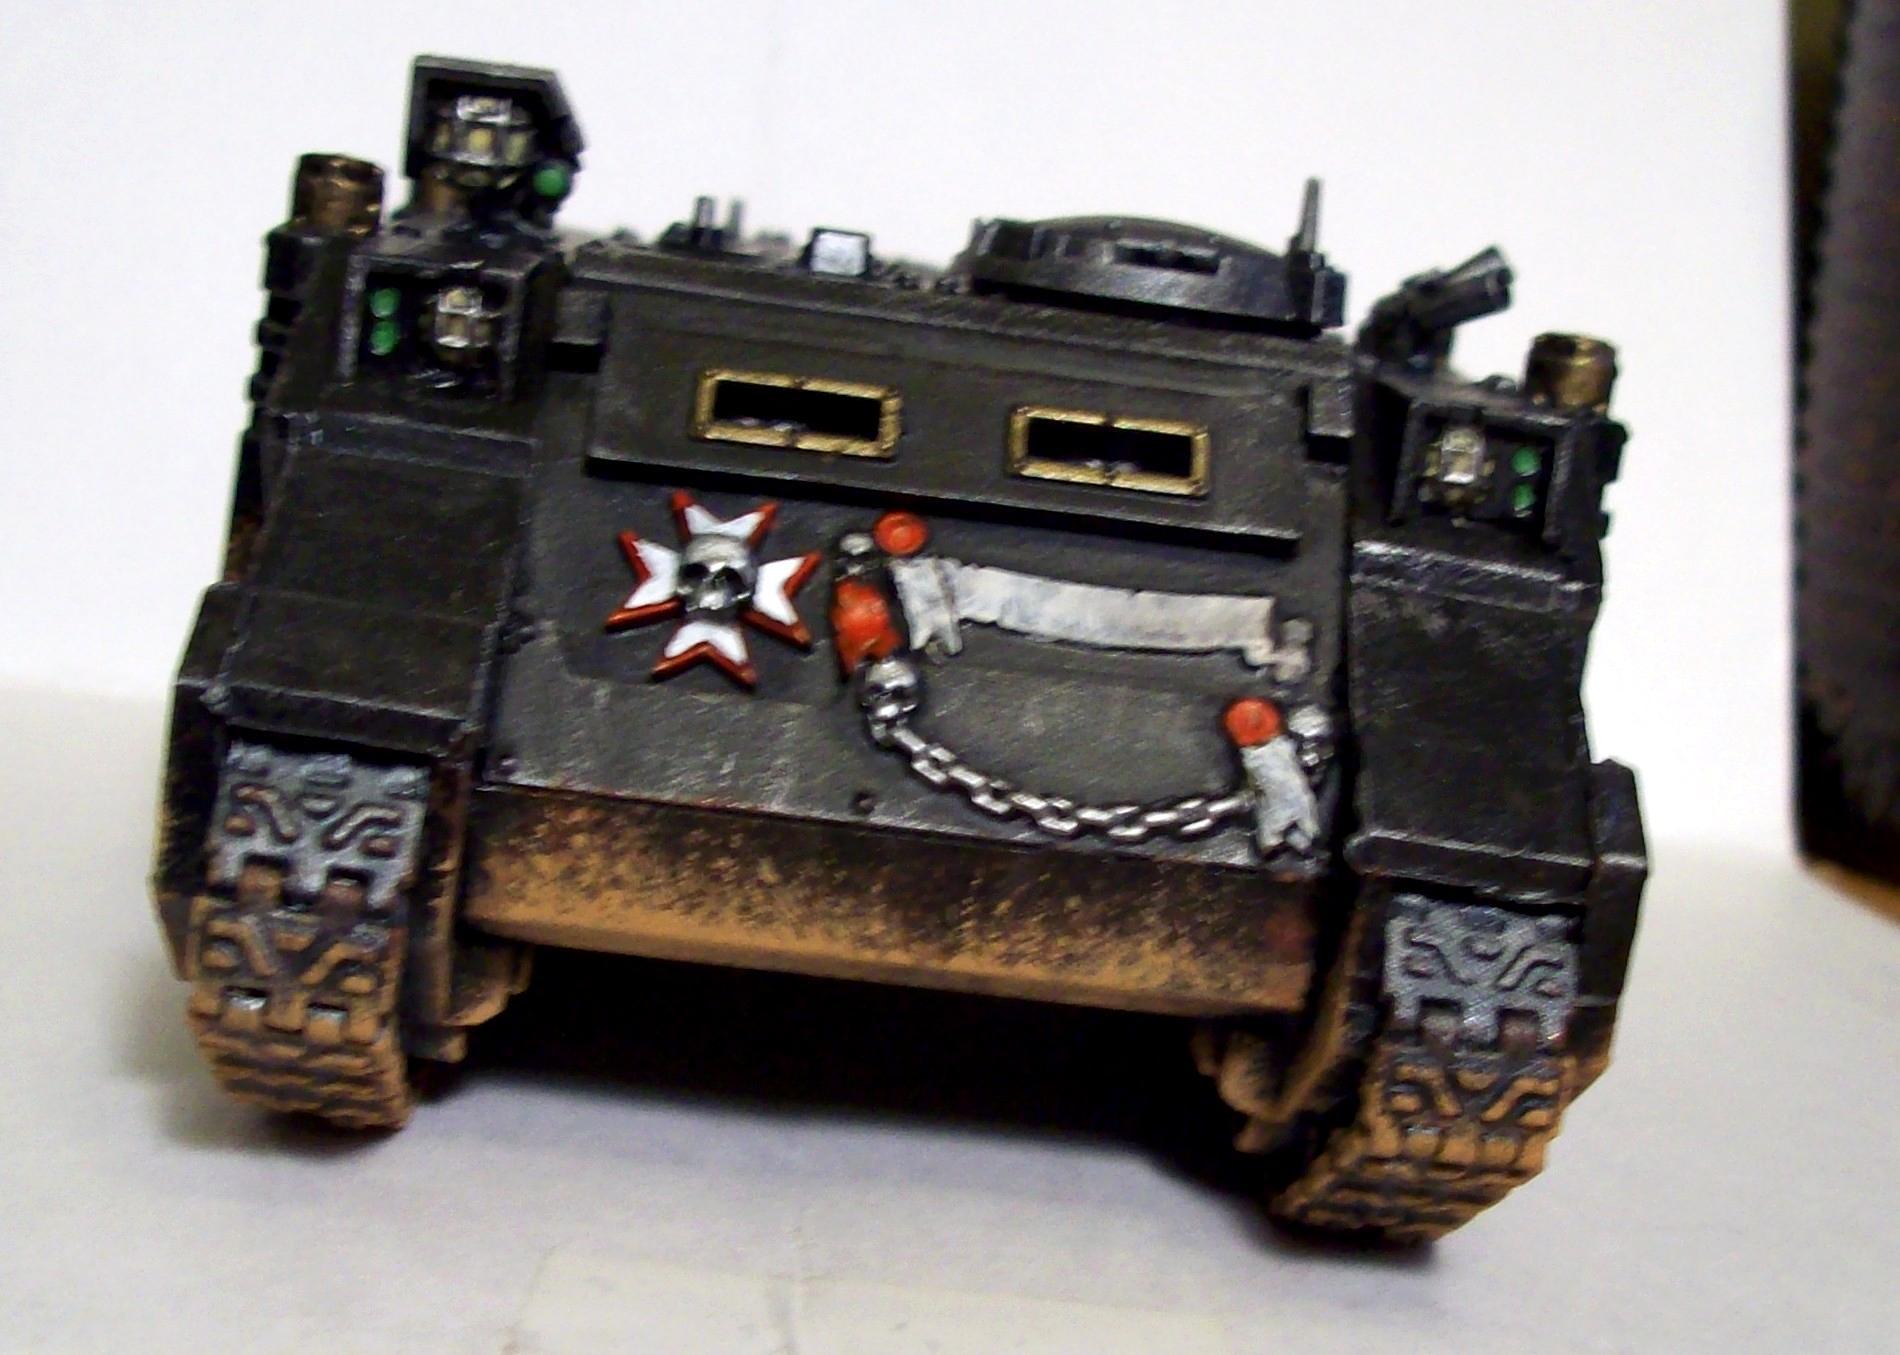 Black Templars, Rhino, Space Marines, Templars, Warhammer 40,000